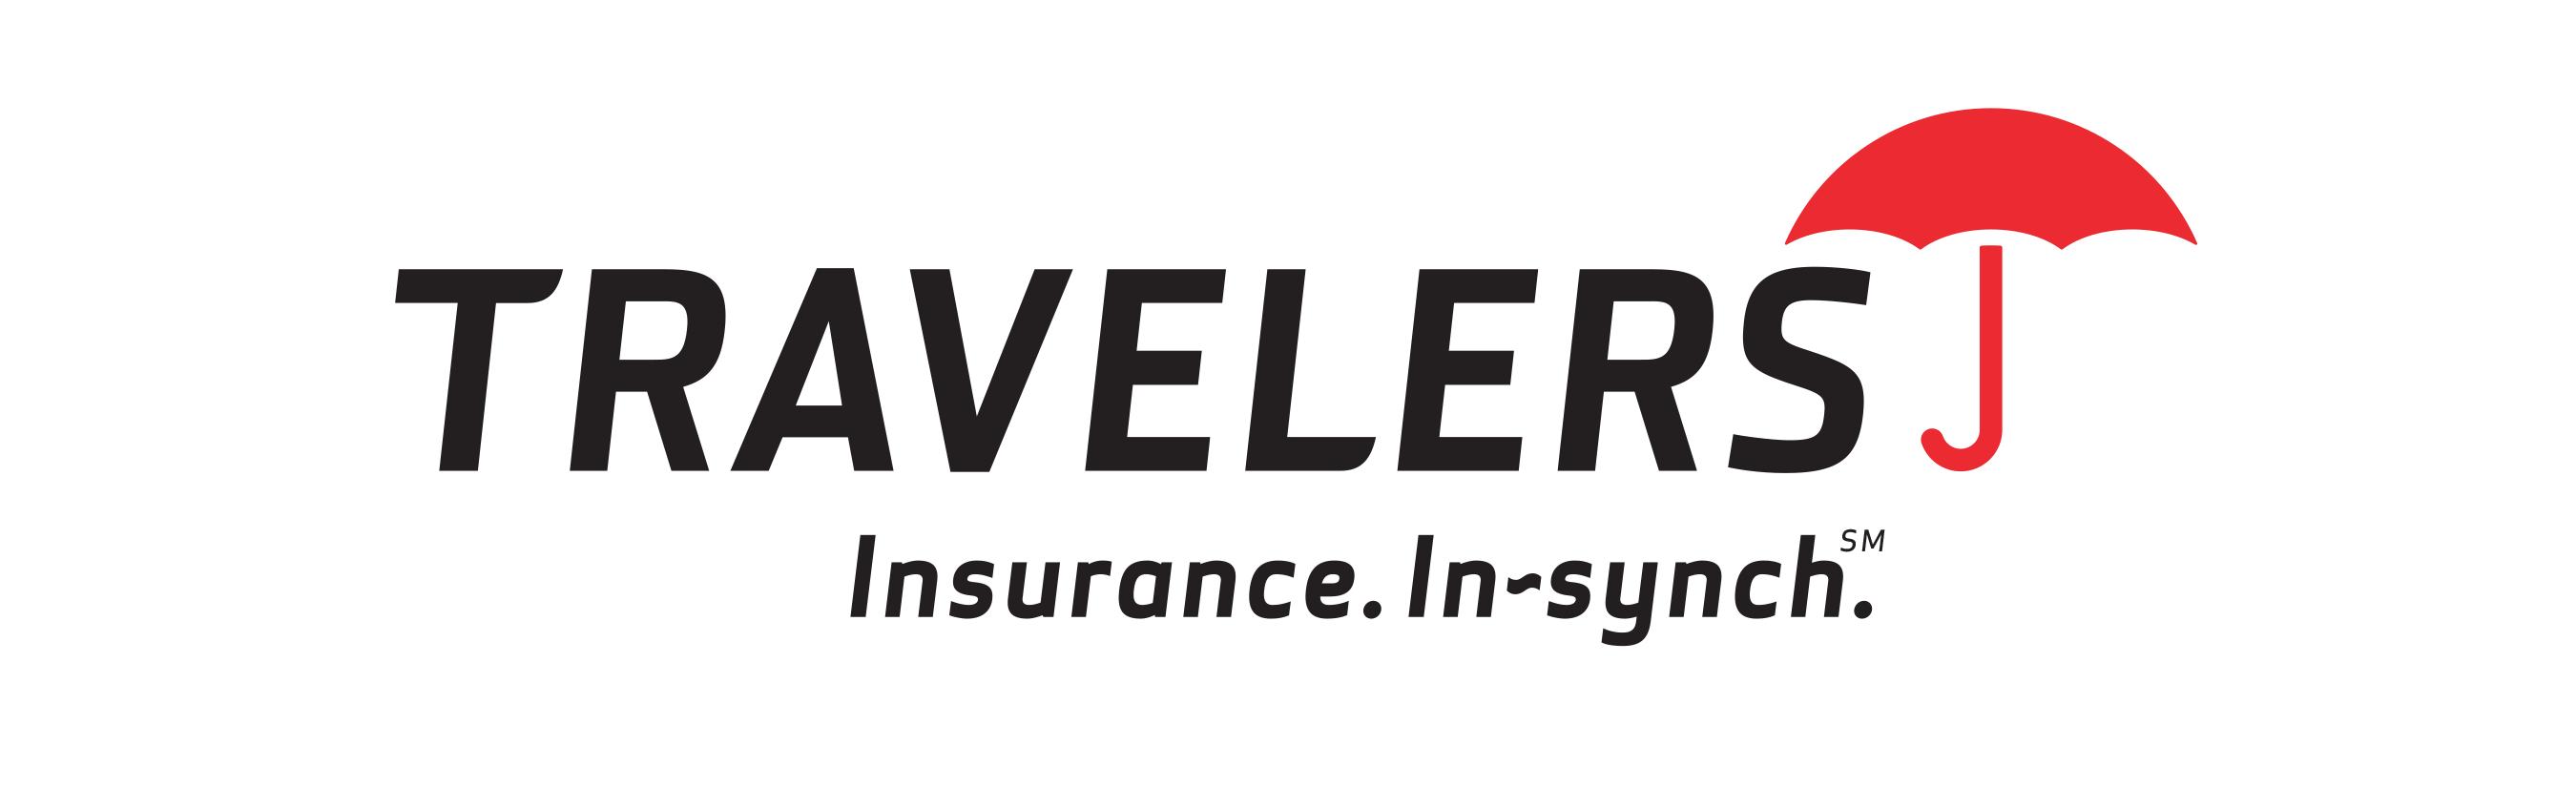 Travelers Auto Insurance Claim Reviews